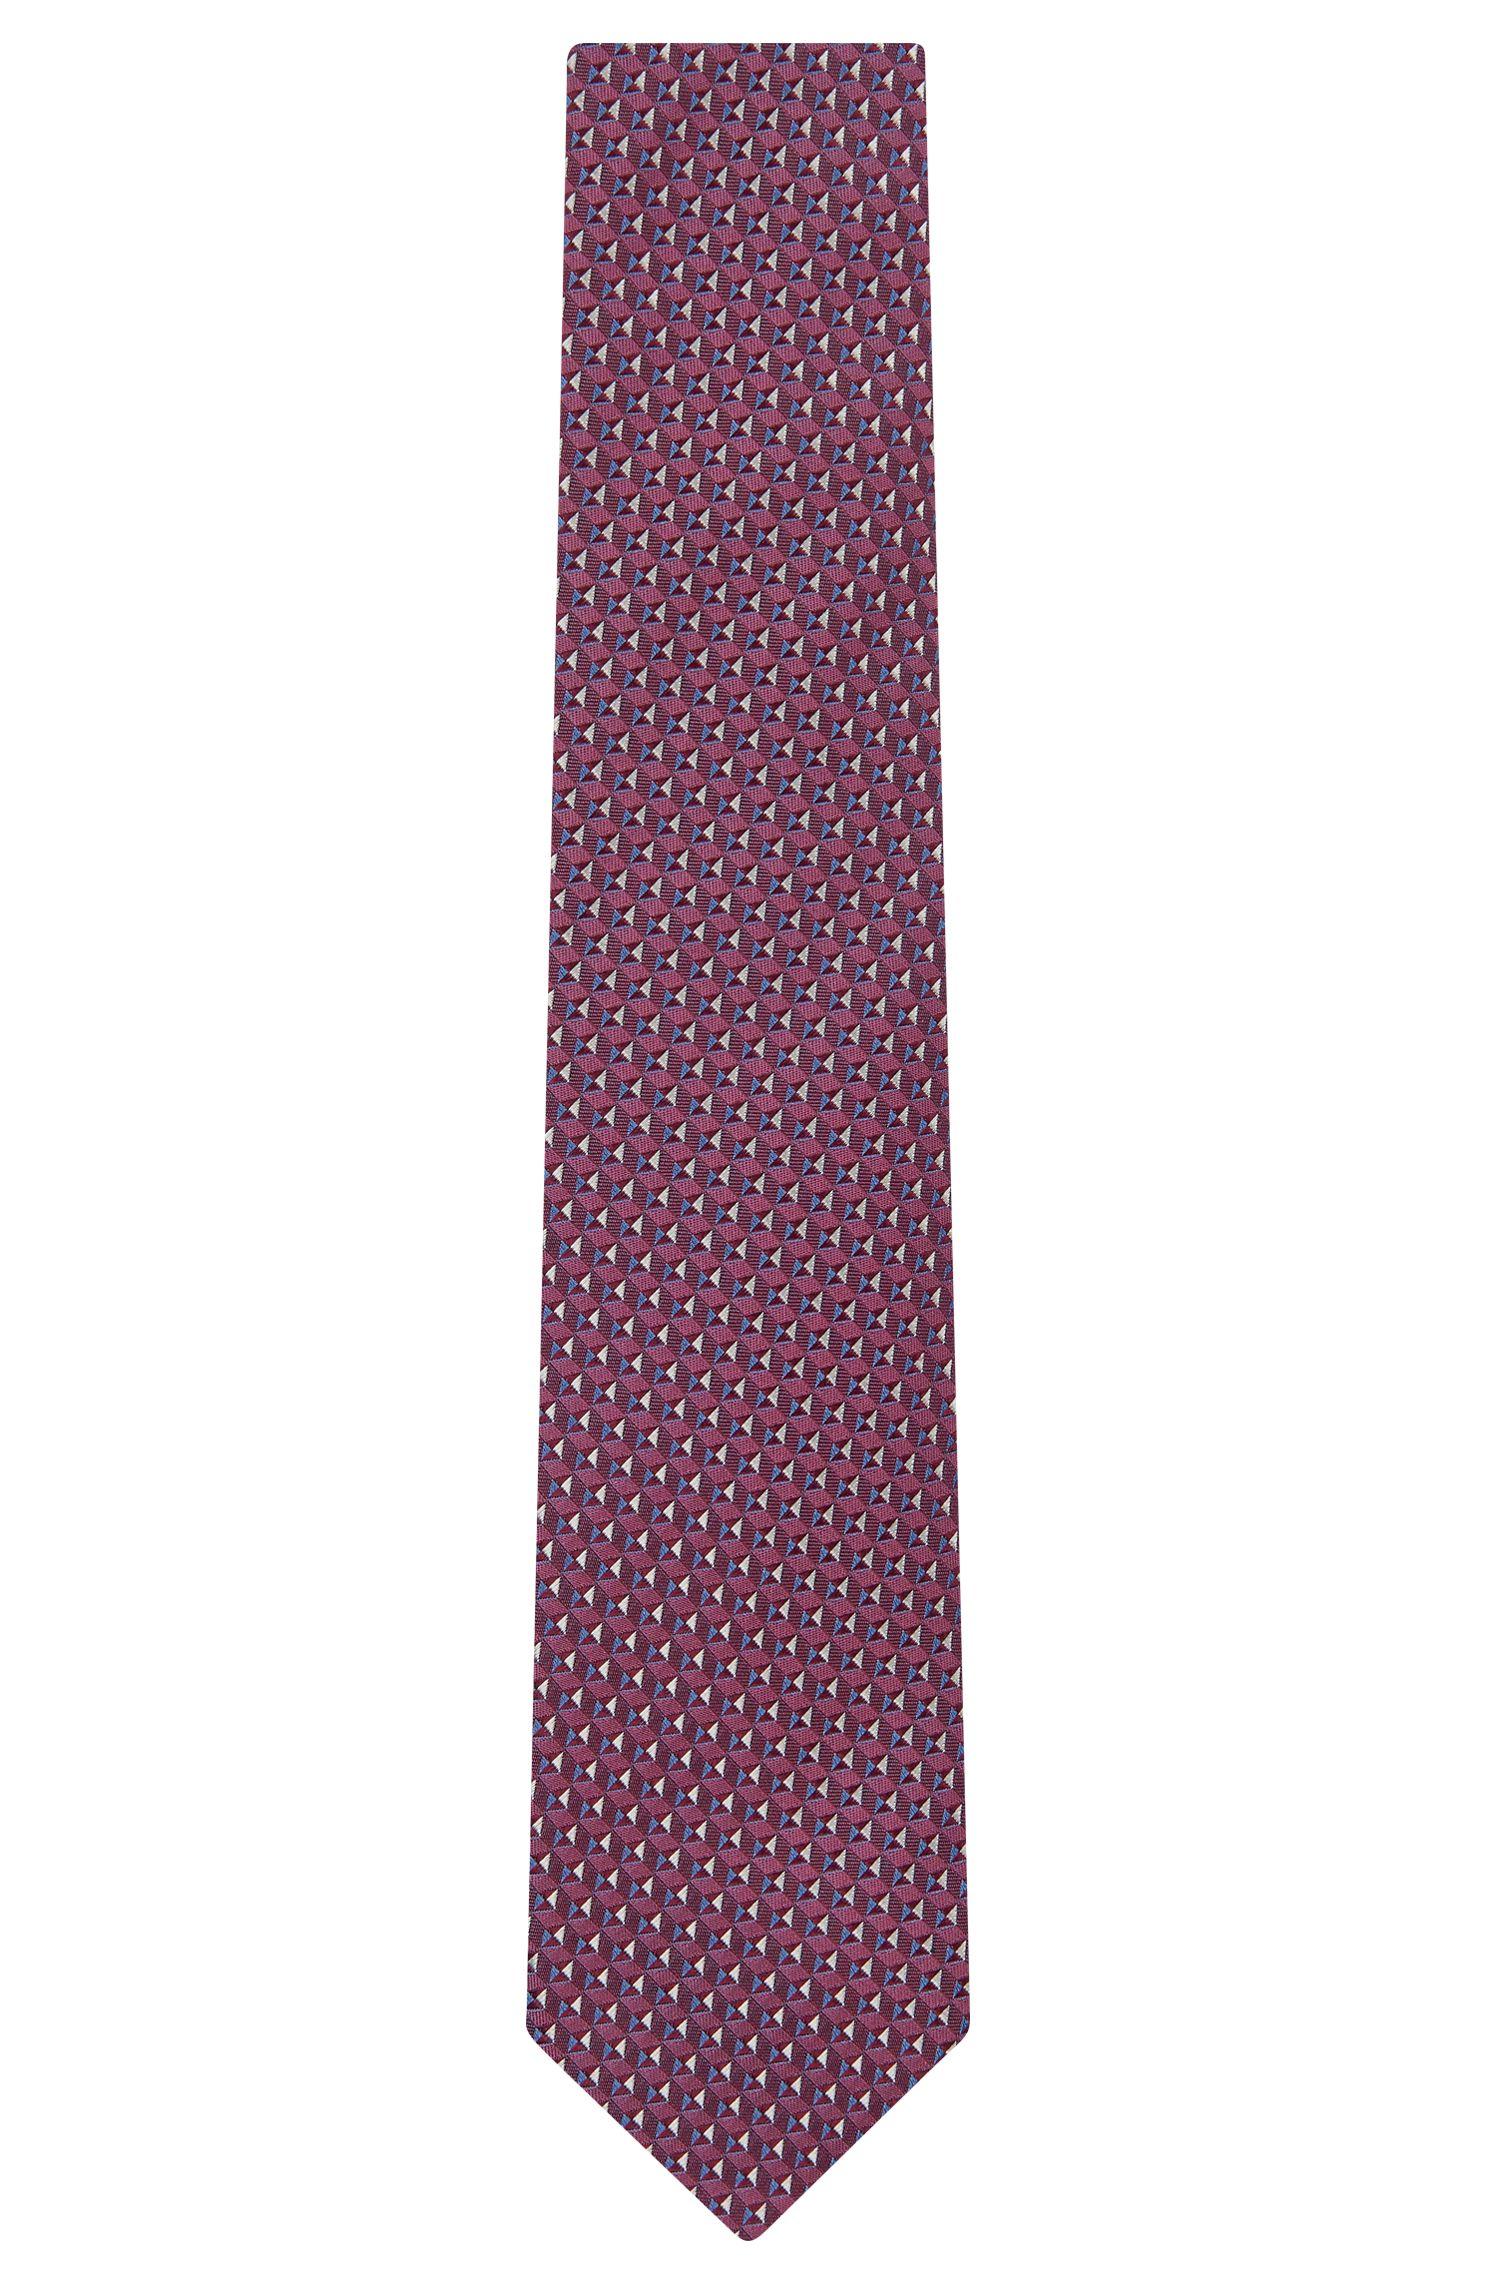 Birdseye Italian Silk Tie, T-Tie 7.5 cm